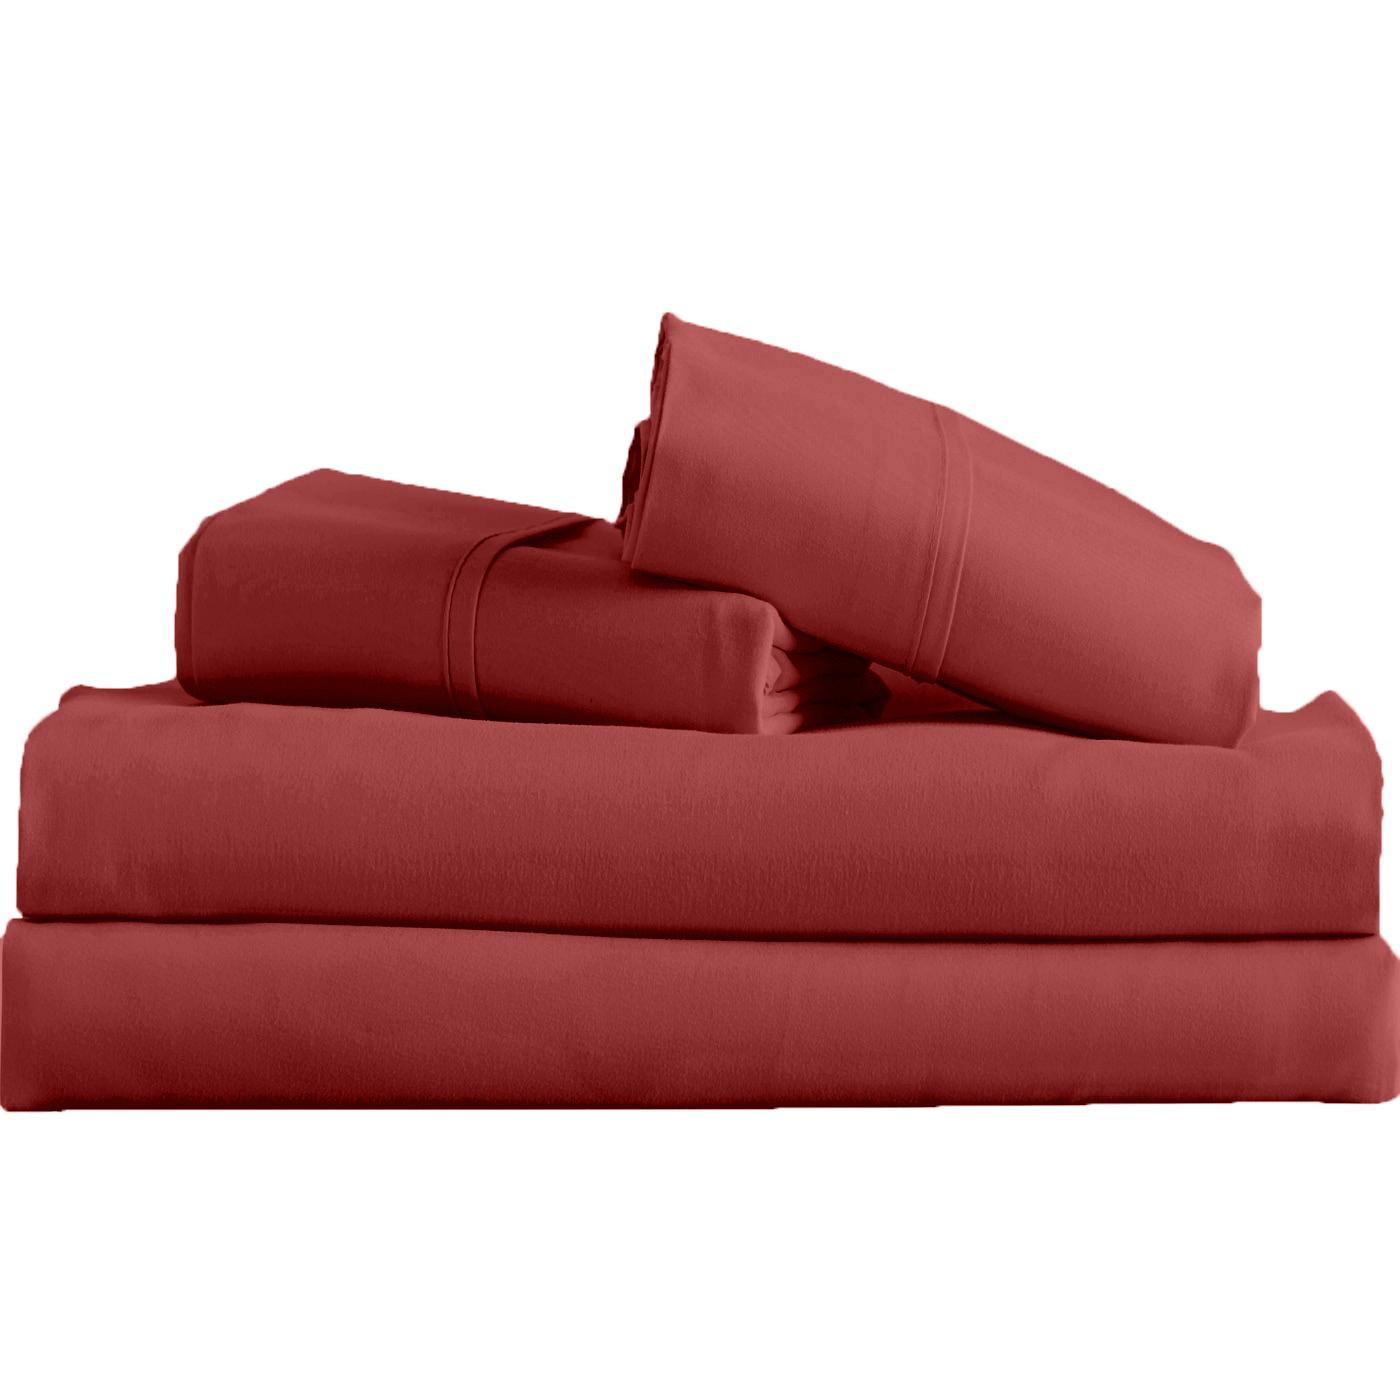 Supreme-Super-Soft-4-Piece-Bed-Sheet-Set-Deep-Pocket-Bedding-All-Colors-Sizes thumbnail 56